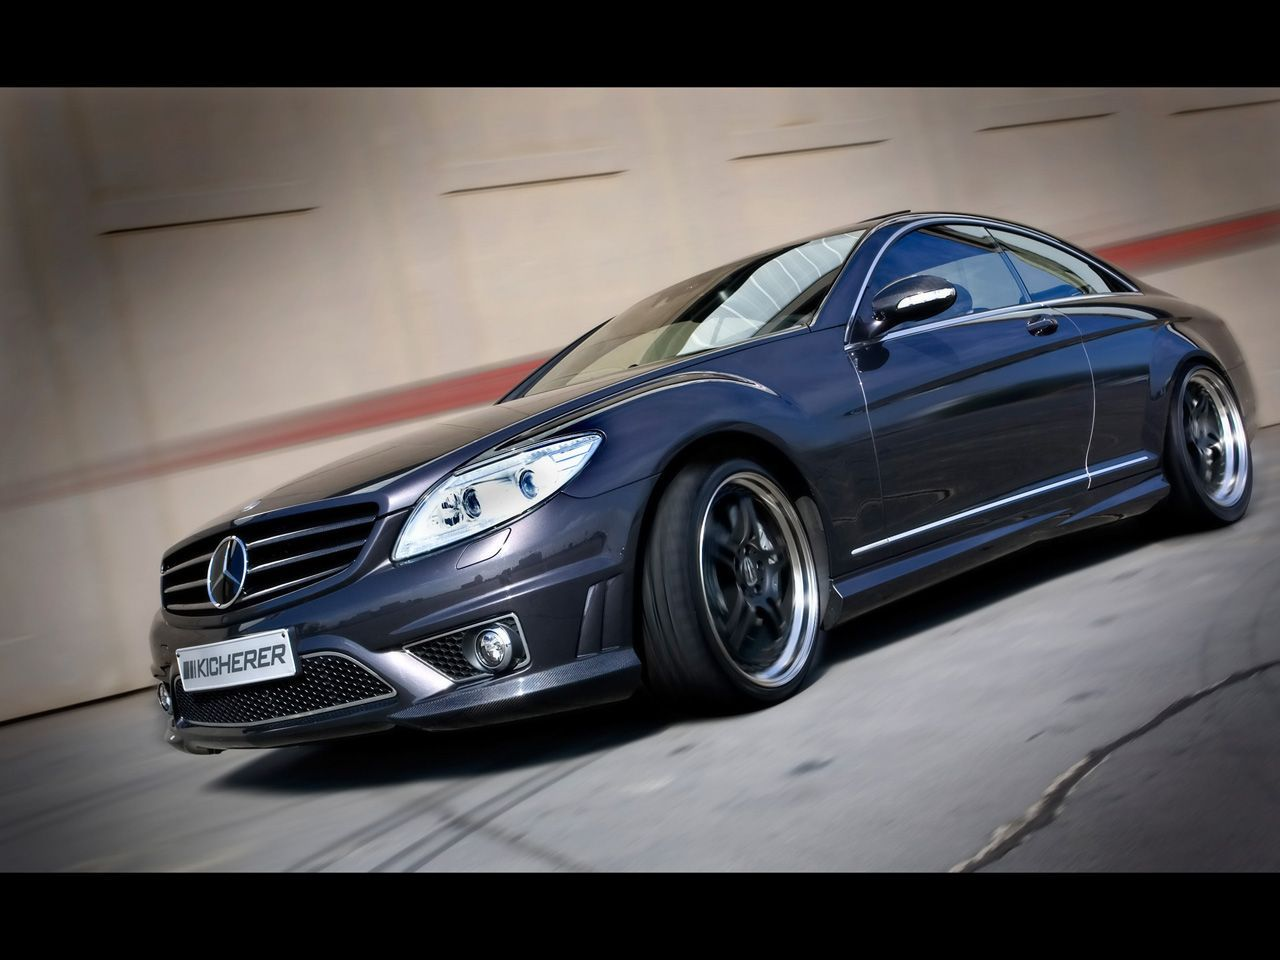 Kicherer Mercedes-Benz CL 60 Coupe